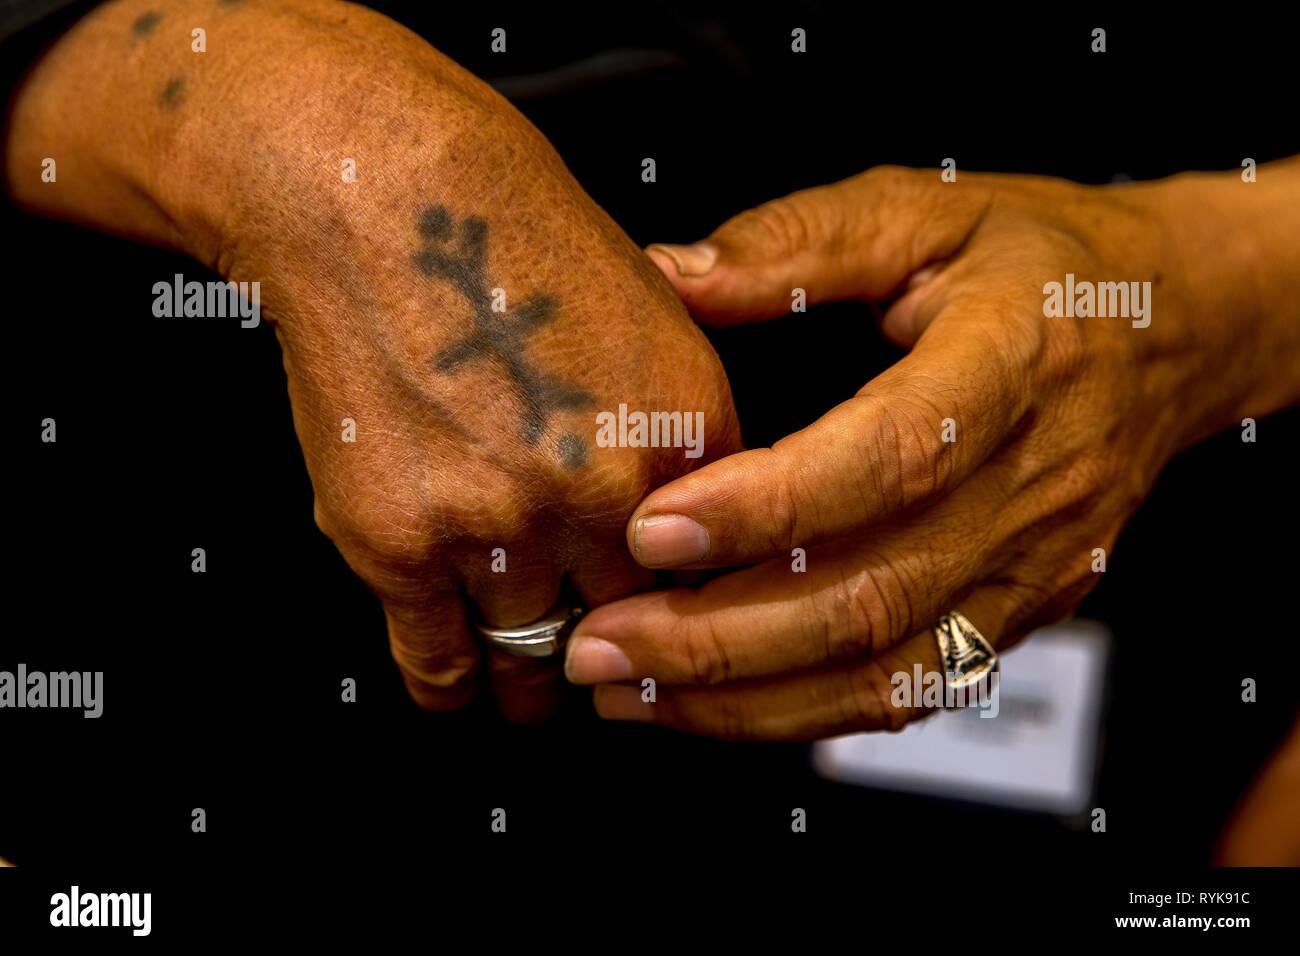 Egyptian coptic christians celebrating Easter in Jerusalem, Israel. - Stock Image